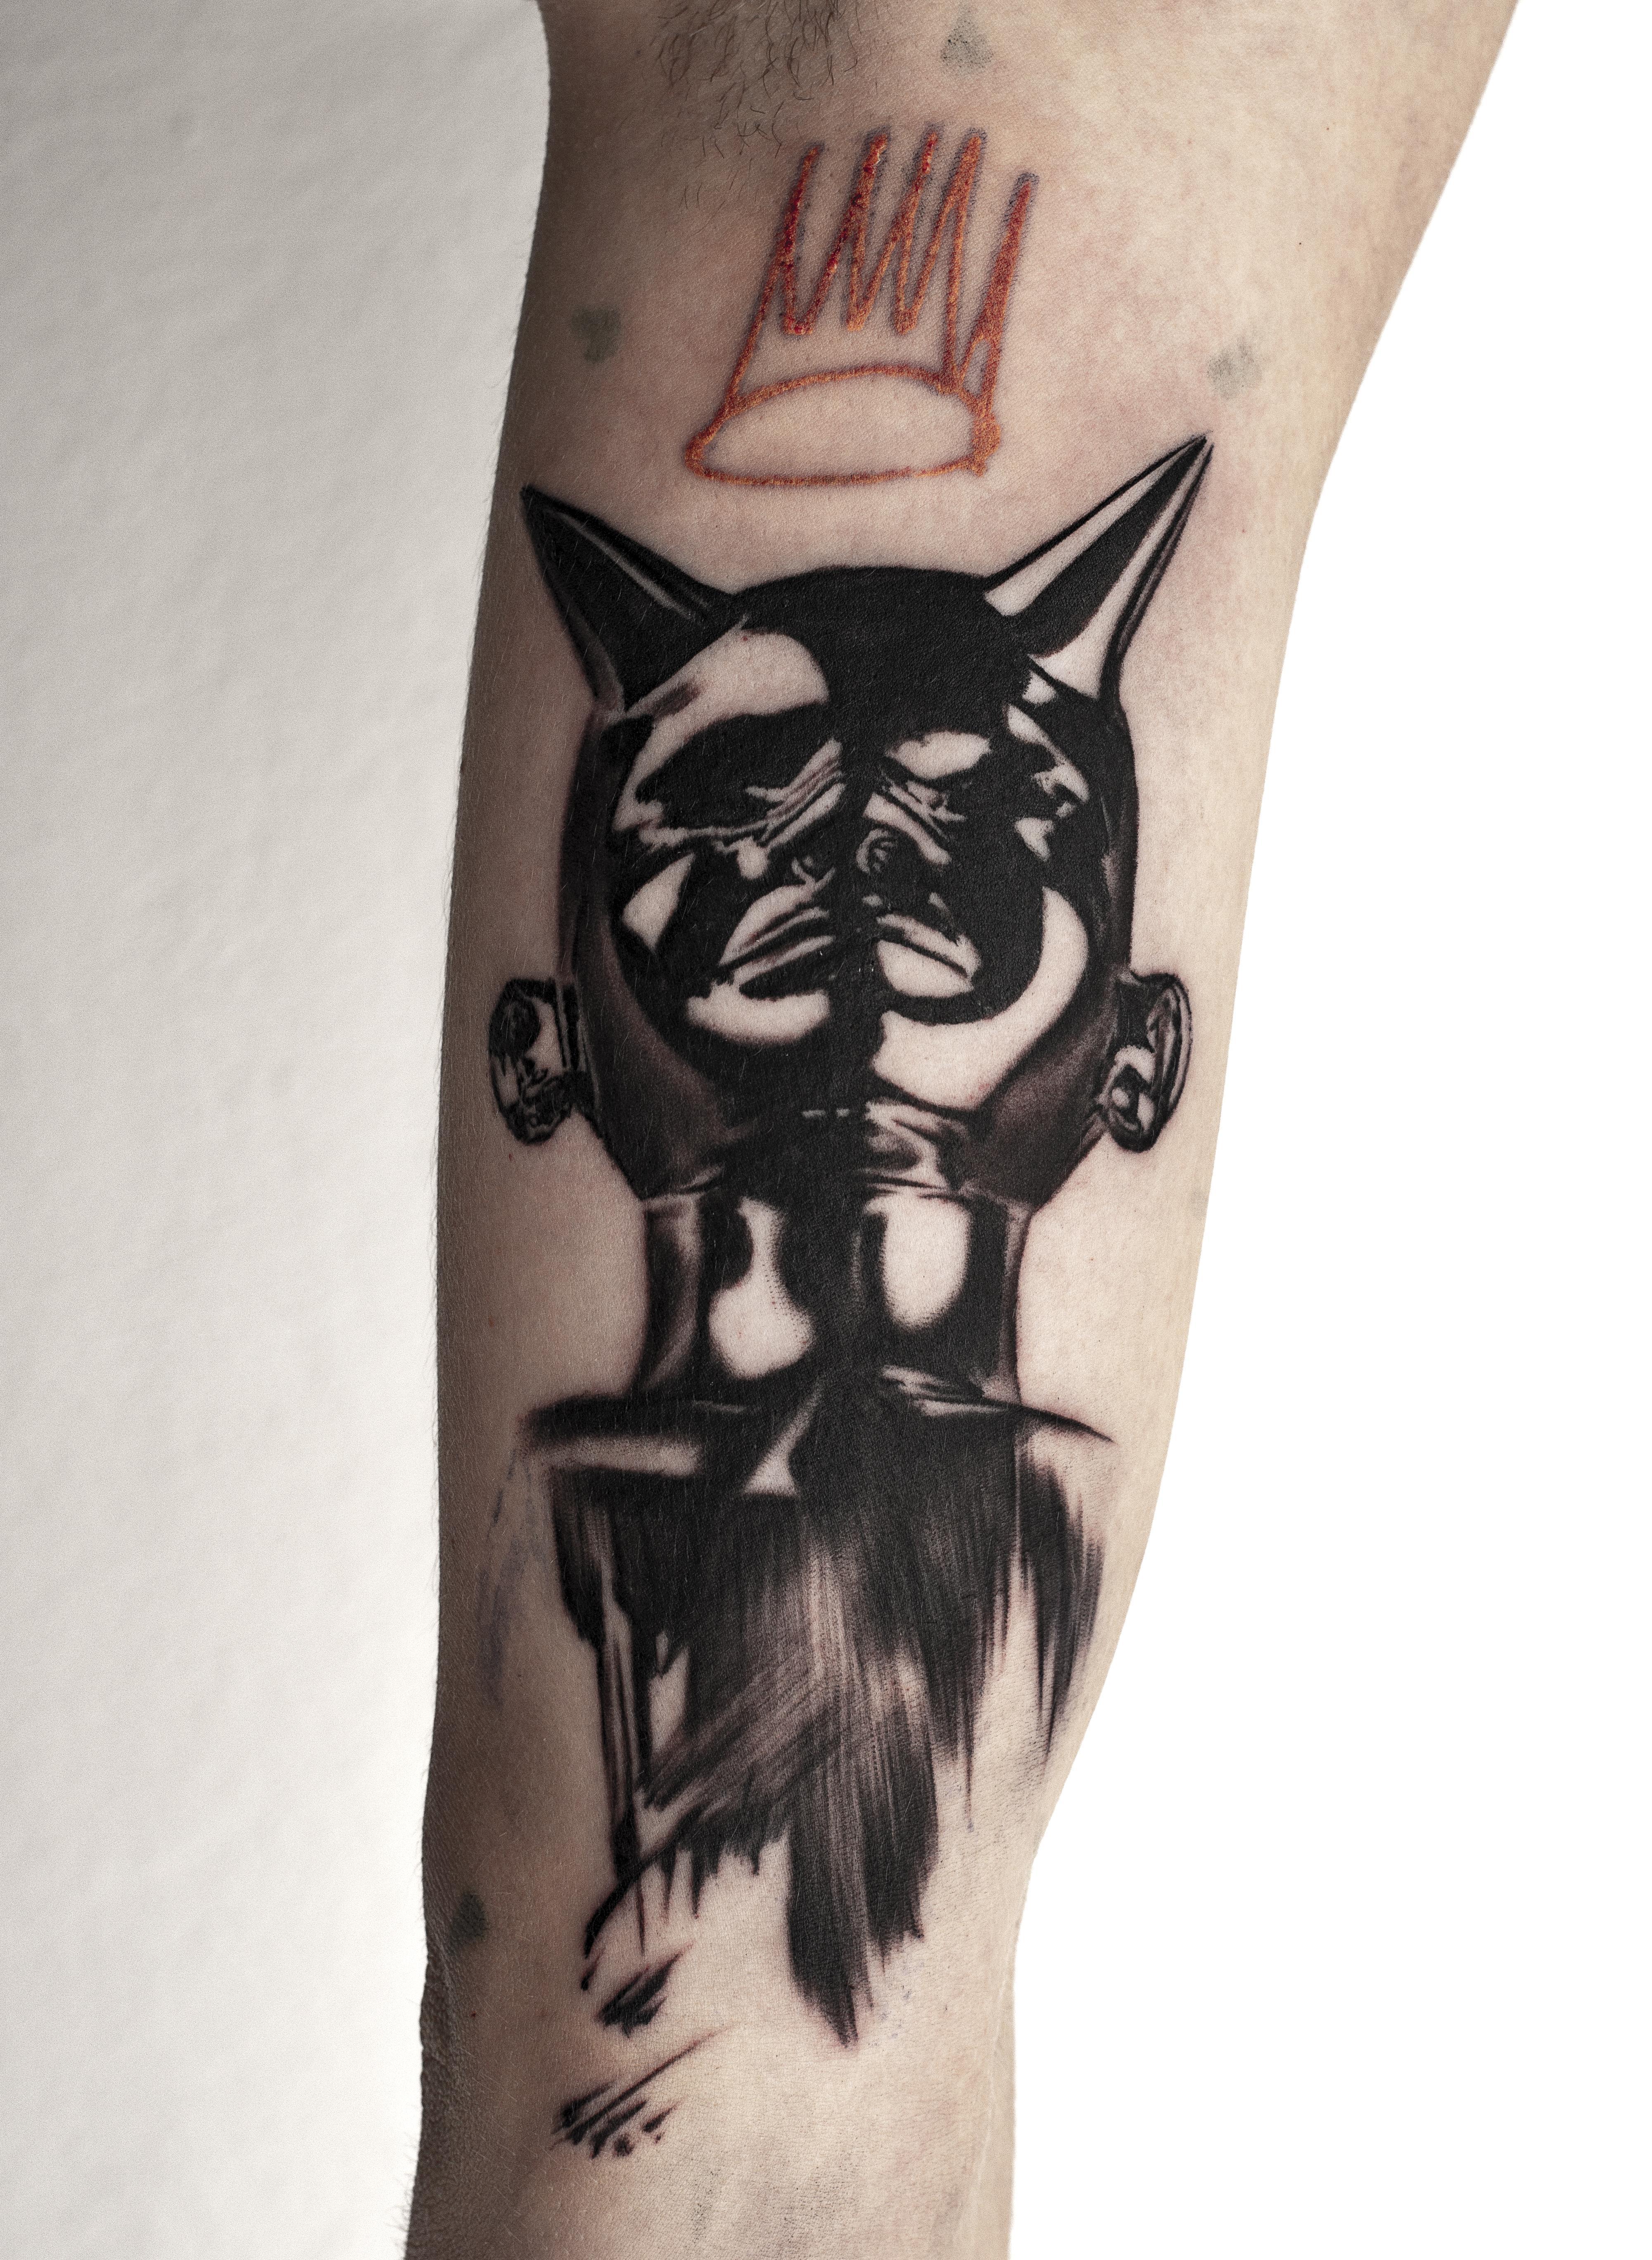 Sinner Tattoos : sinner, tattoos, First, Tattoo:, Album, Cover, Cole's,